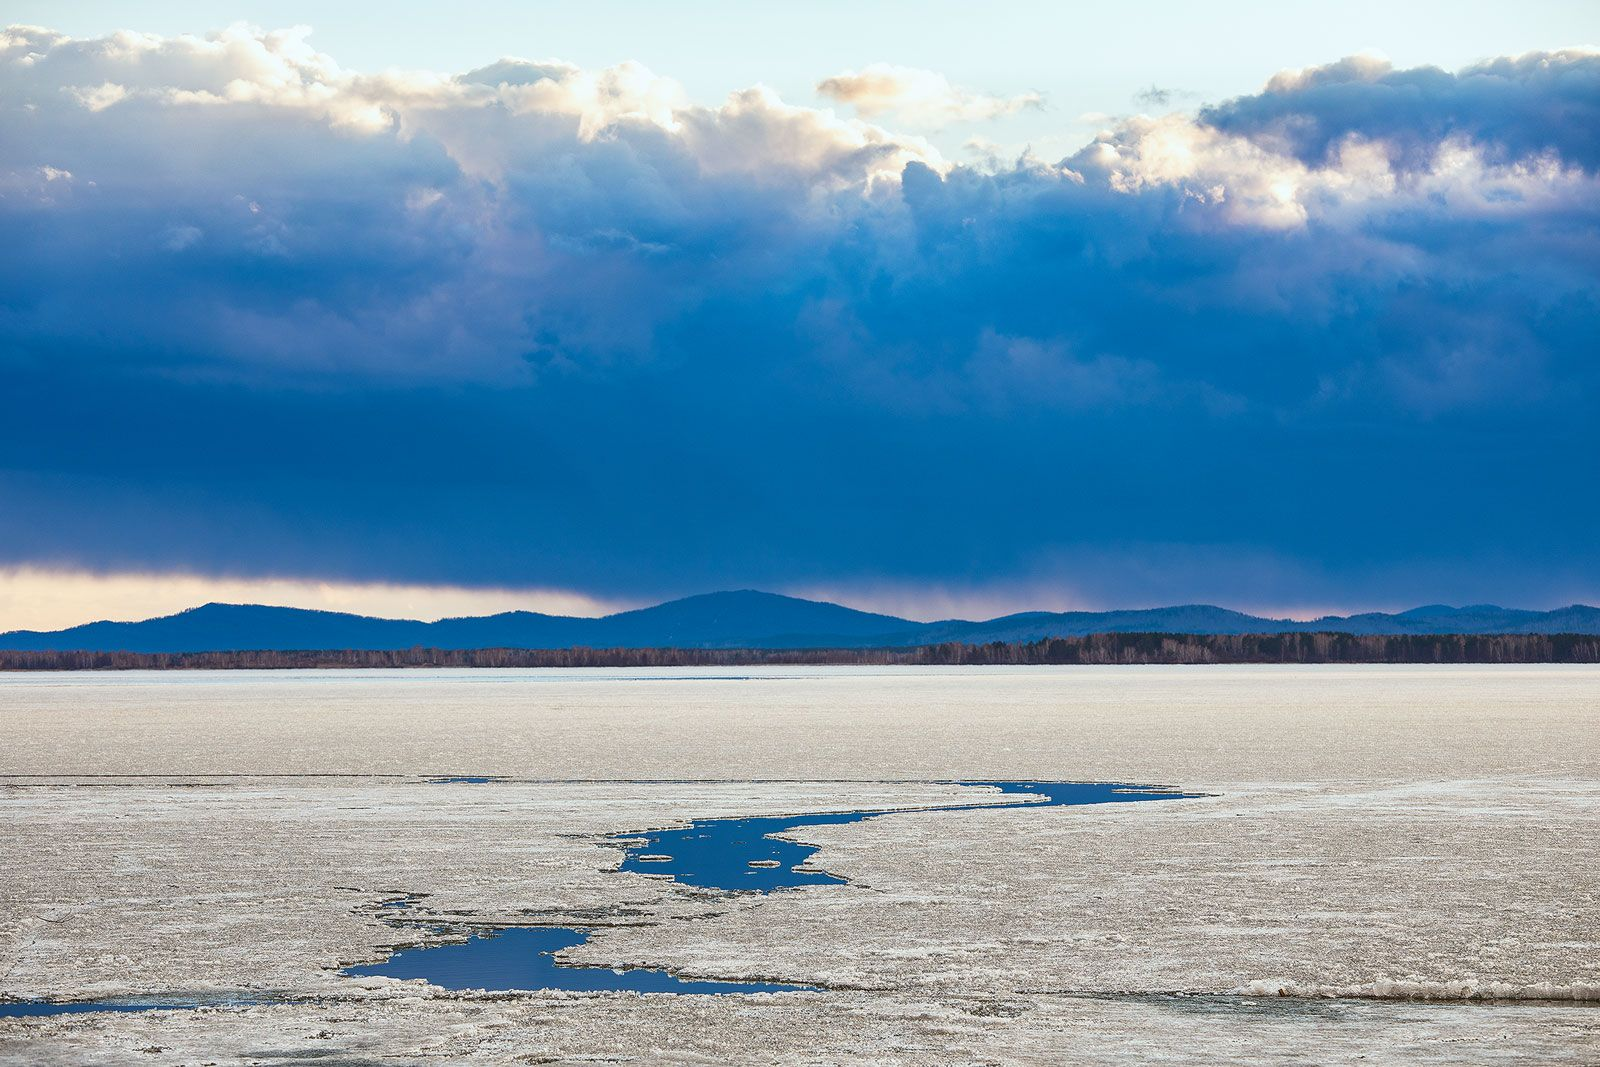 цветовой минимализм апреля пейзаж тучи вечер закат лес озеро синий проталина